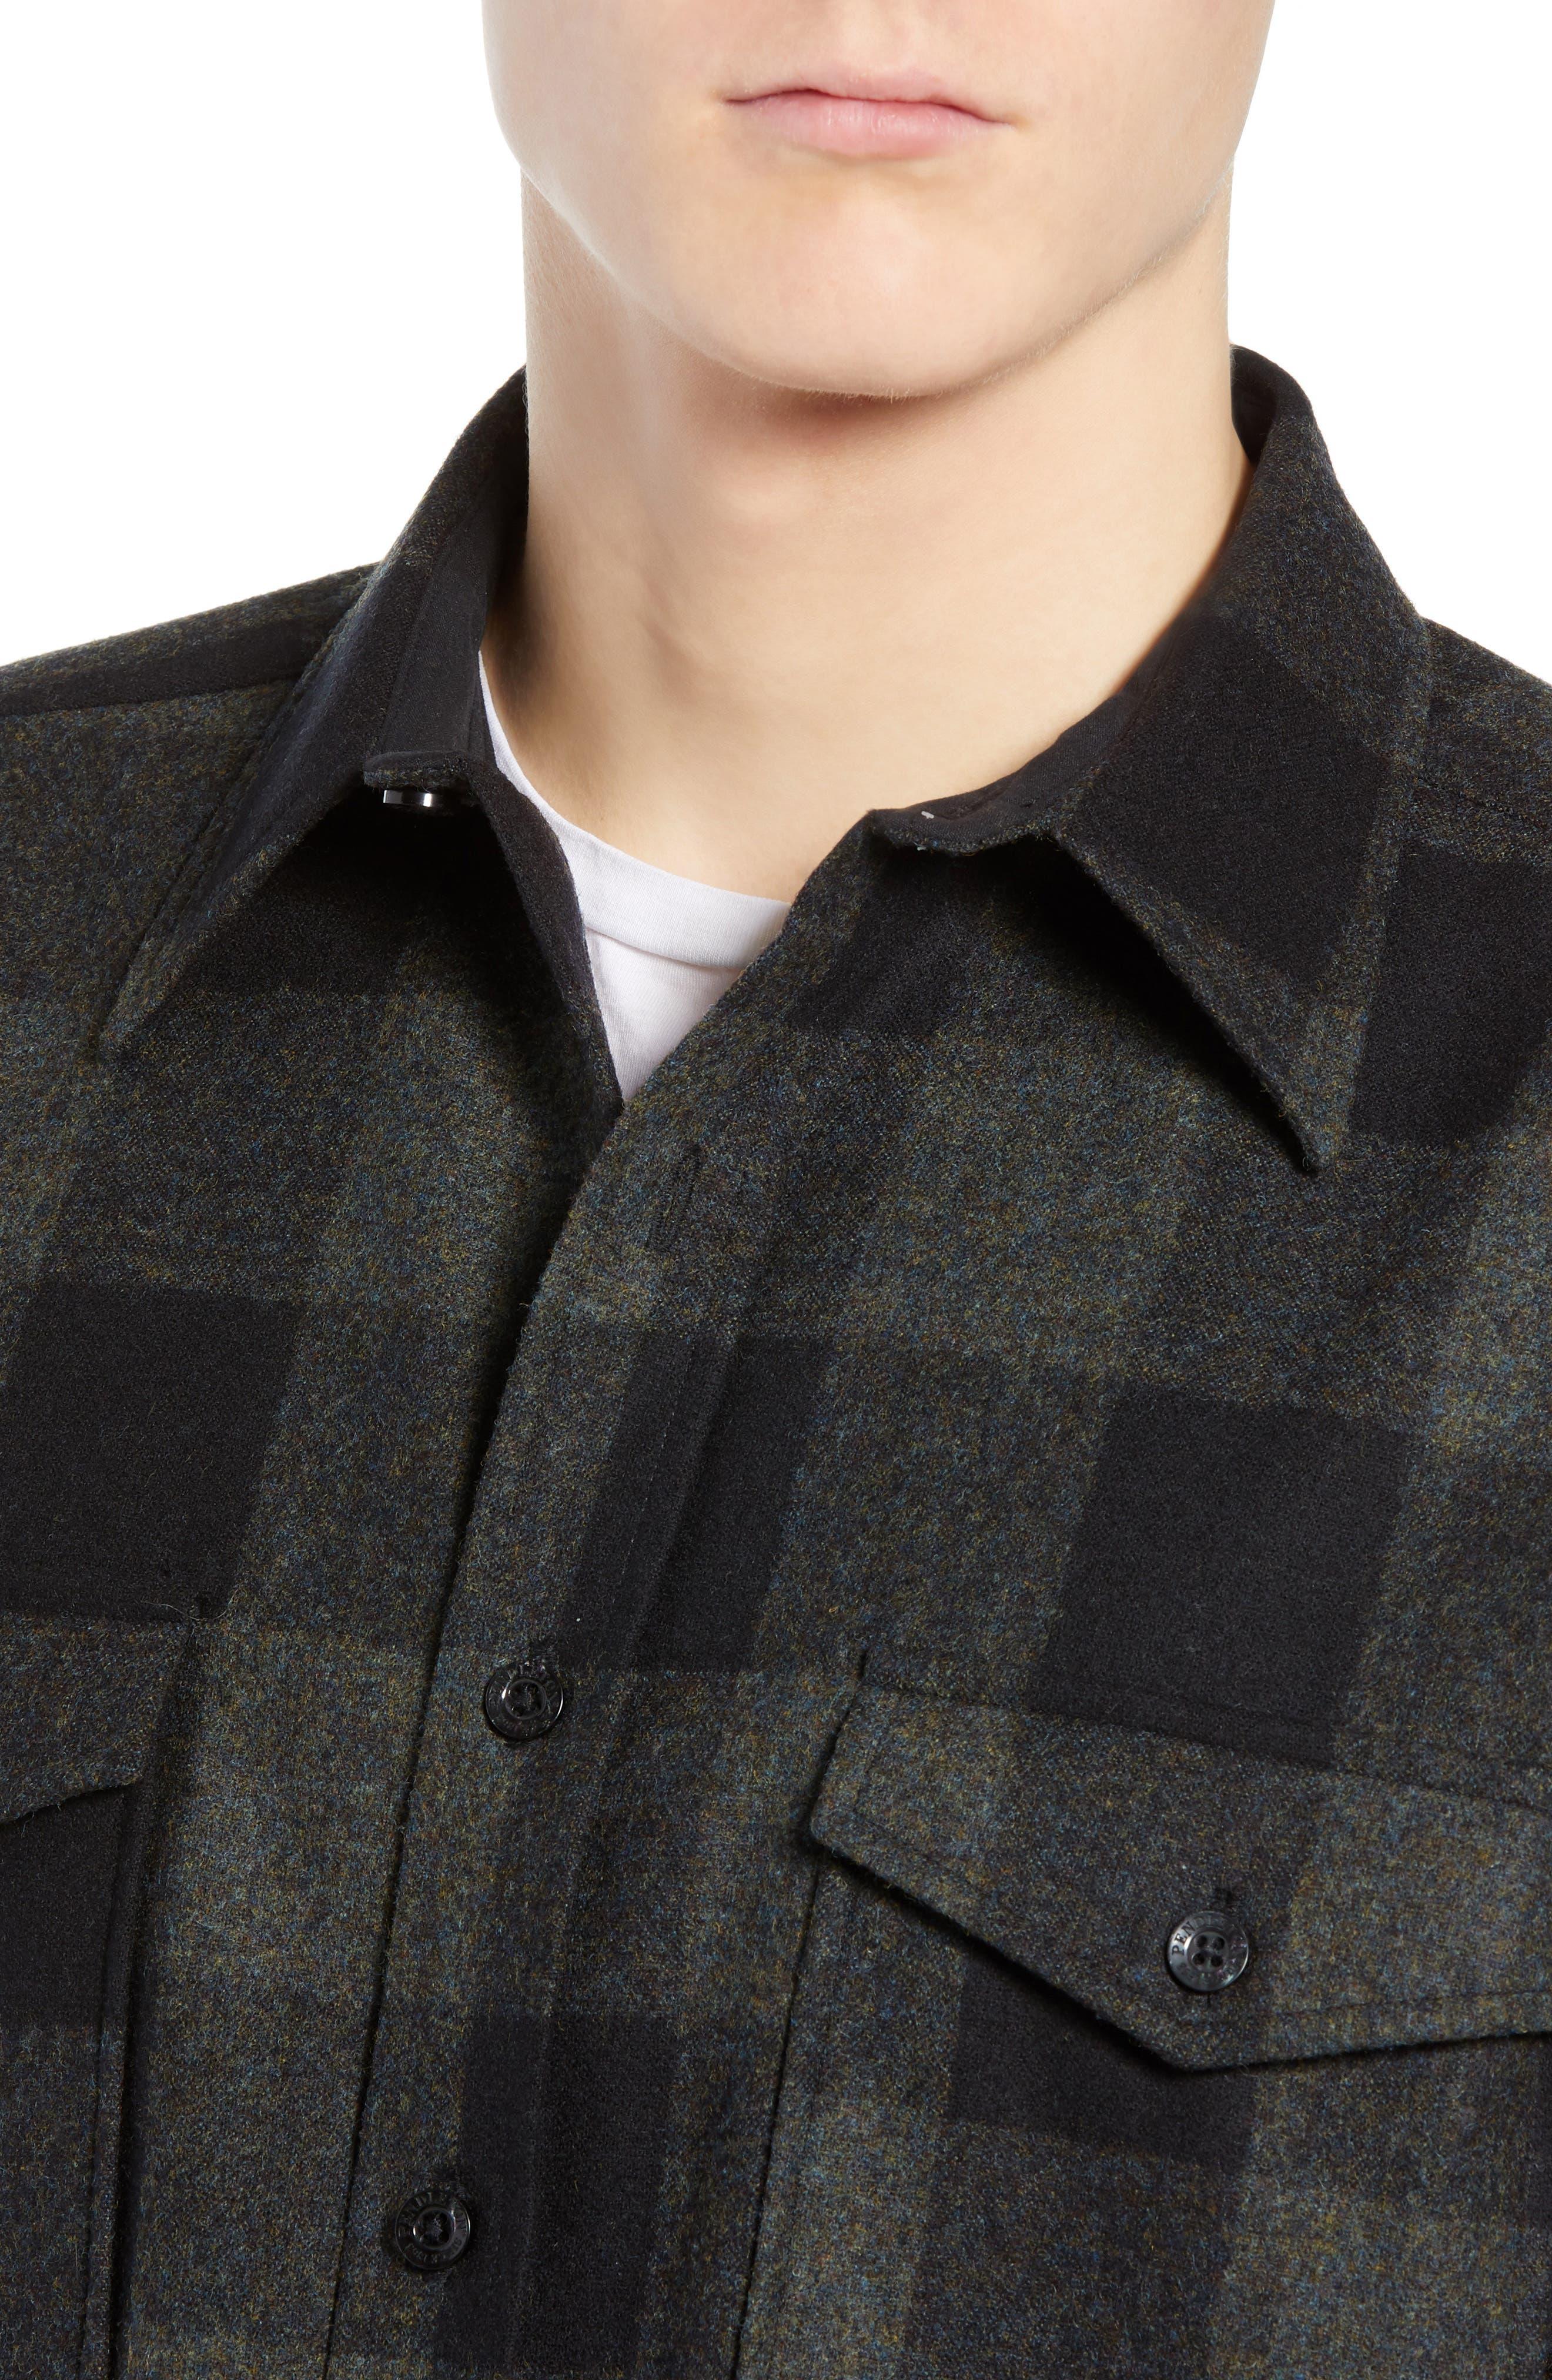 Guide Wool Shirt,                             Alternate thumbnail 2, color,                             BLUE GREEN BUFFALO CHECK